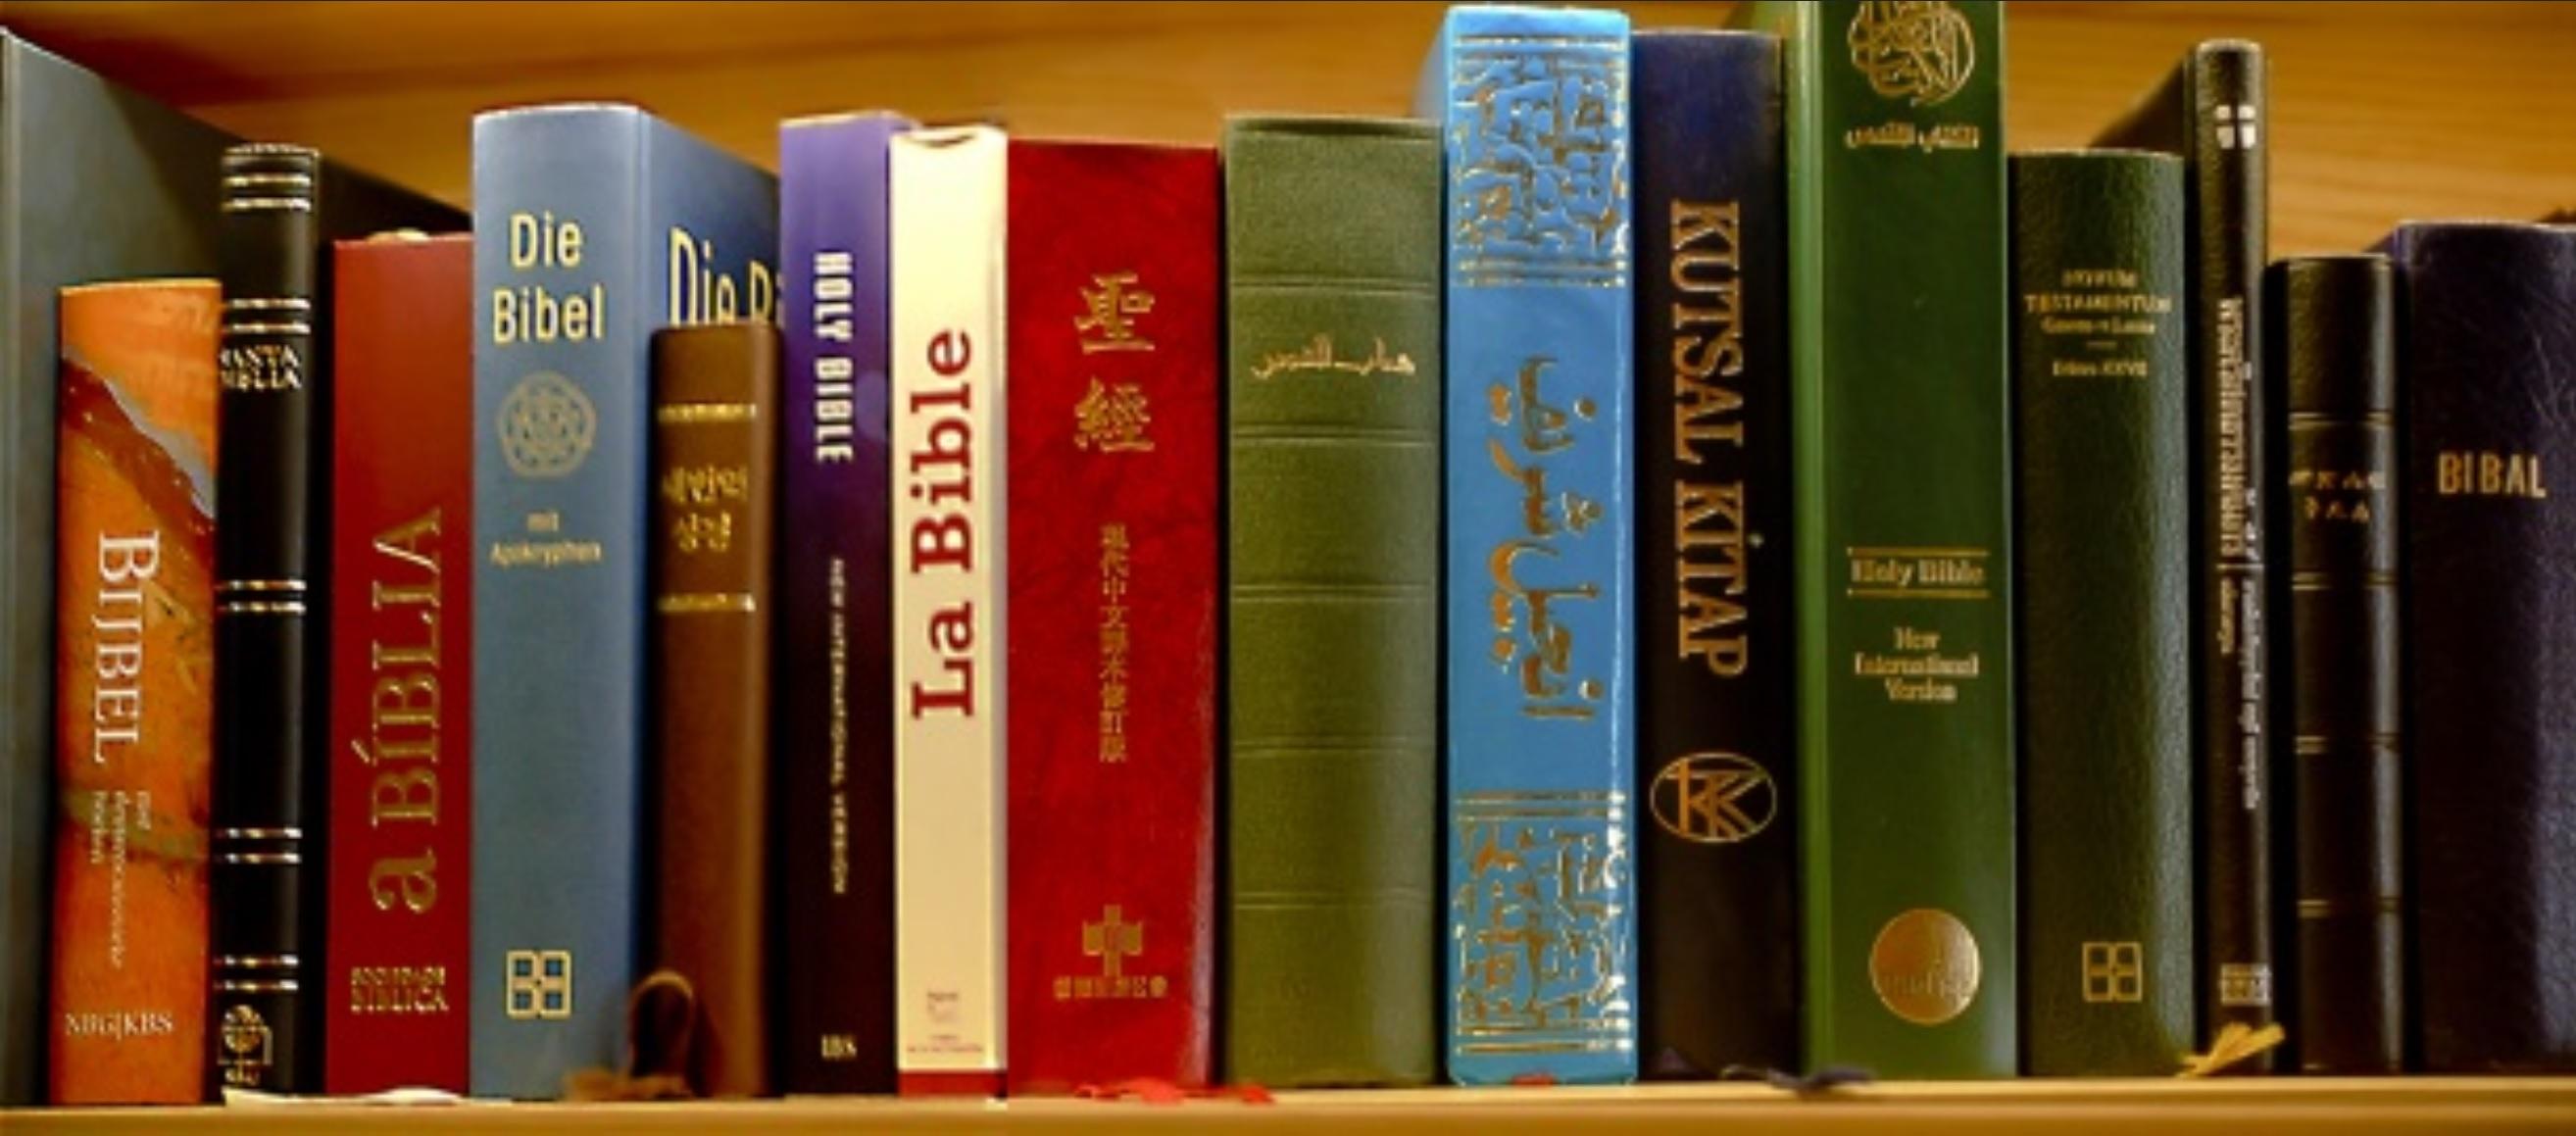 2021-09-07 Bible Translations